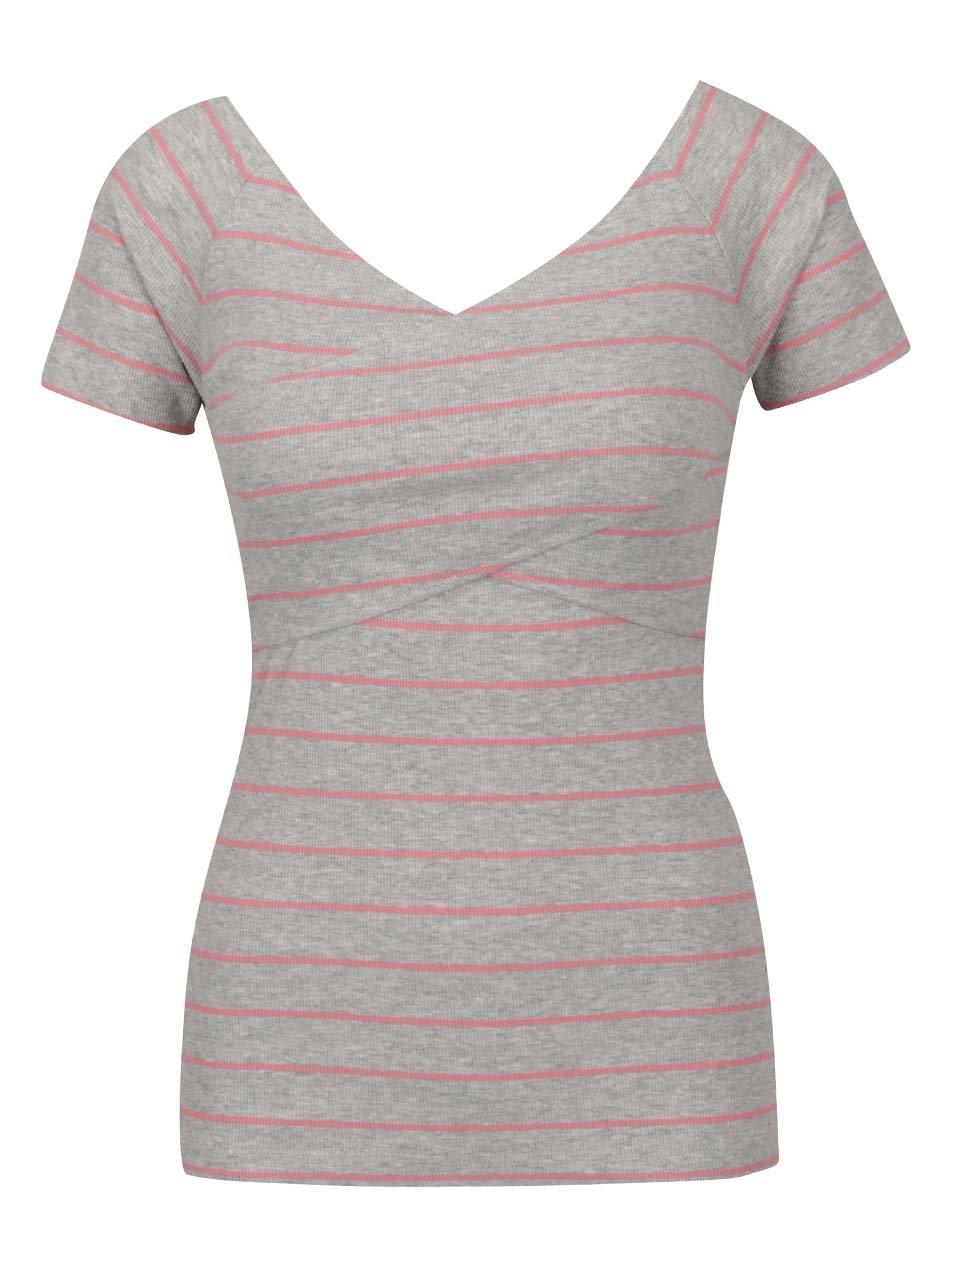 Růžovo-šedé pruhované tričko s krátkým rukávem ONLY Claudia